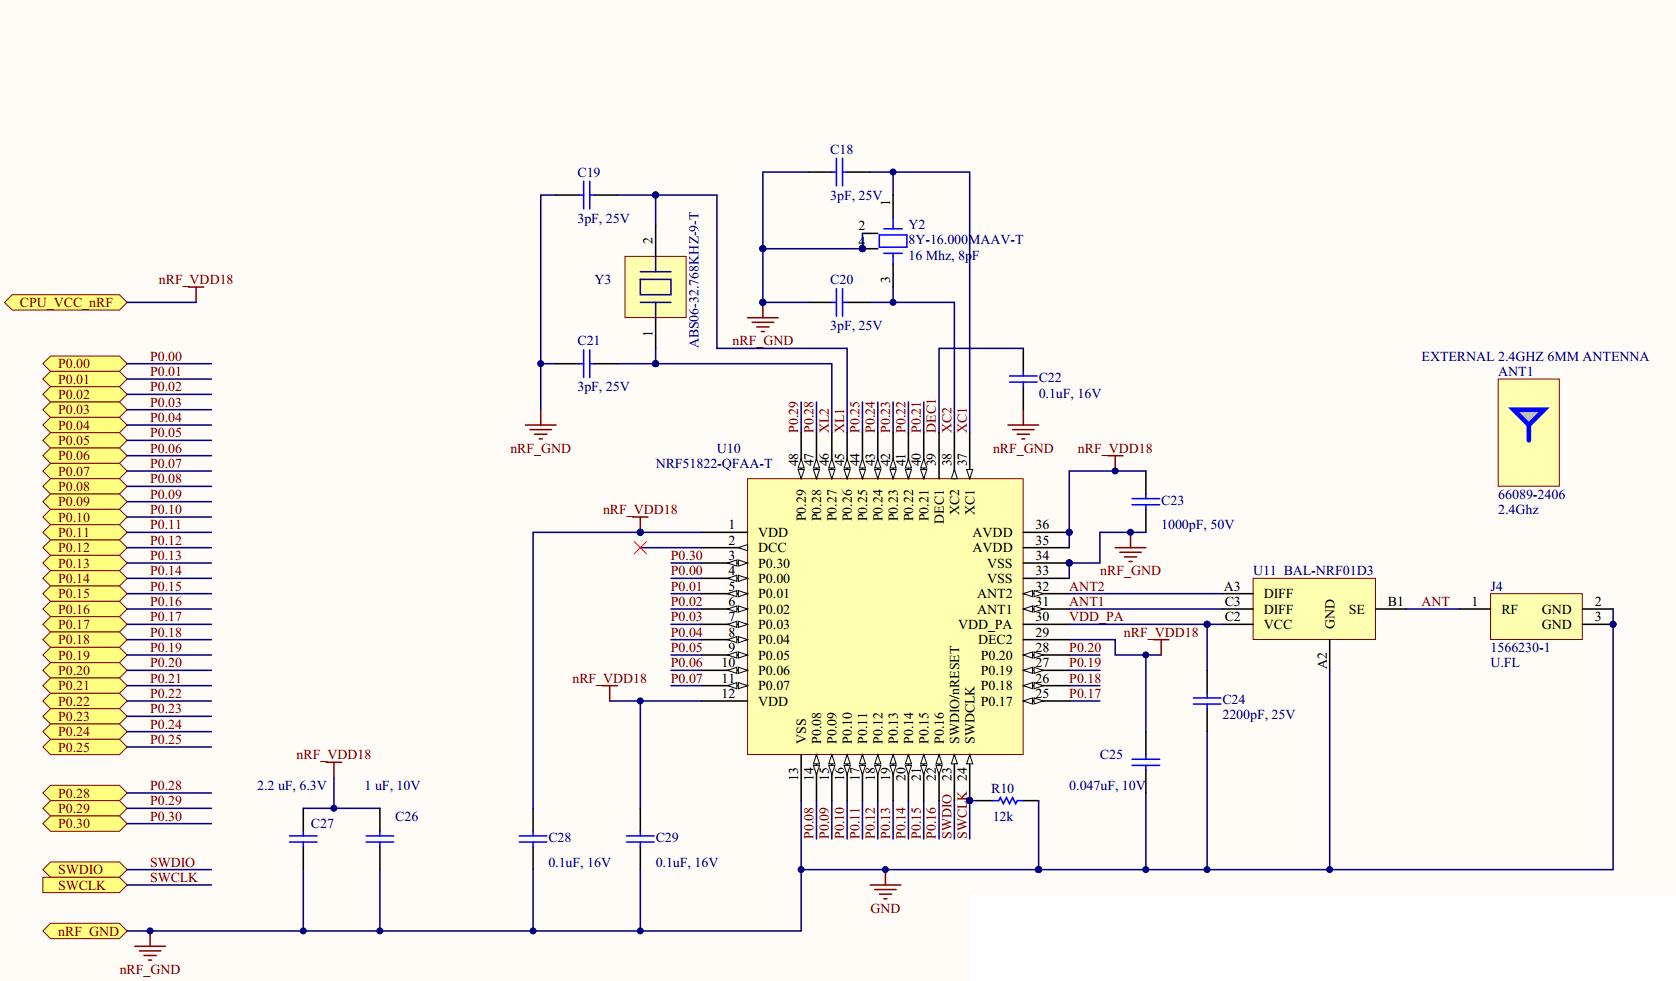 nrf51822 low voltage mode, can't program part - Nordic DevZone